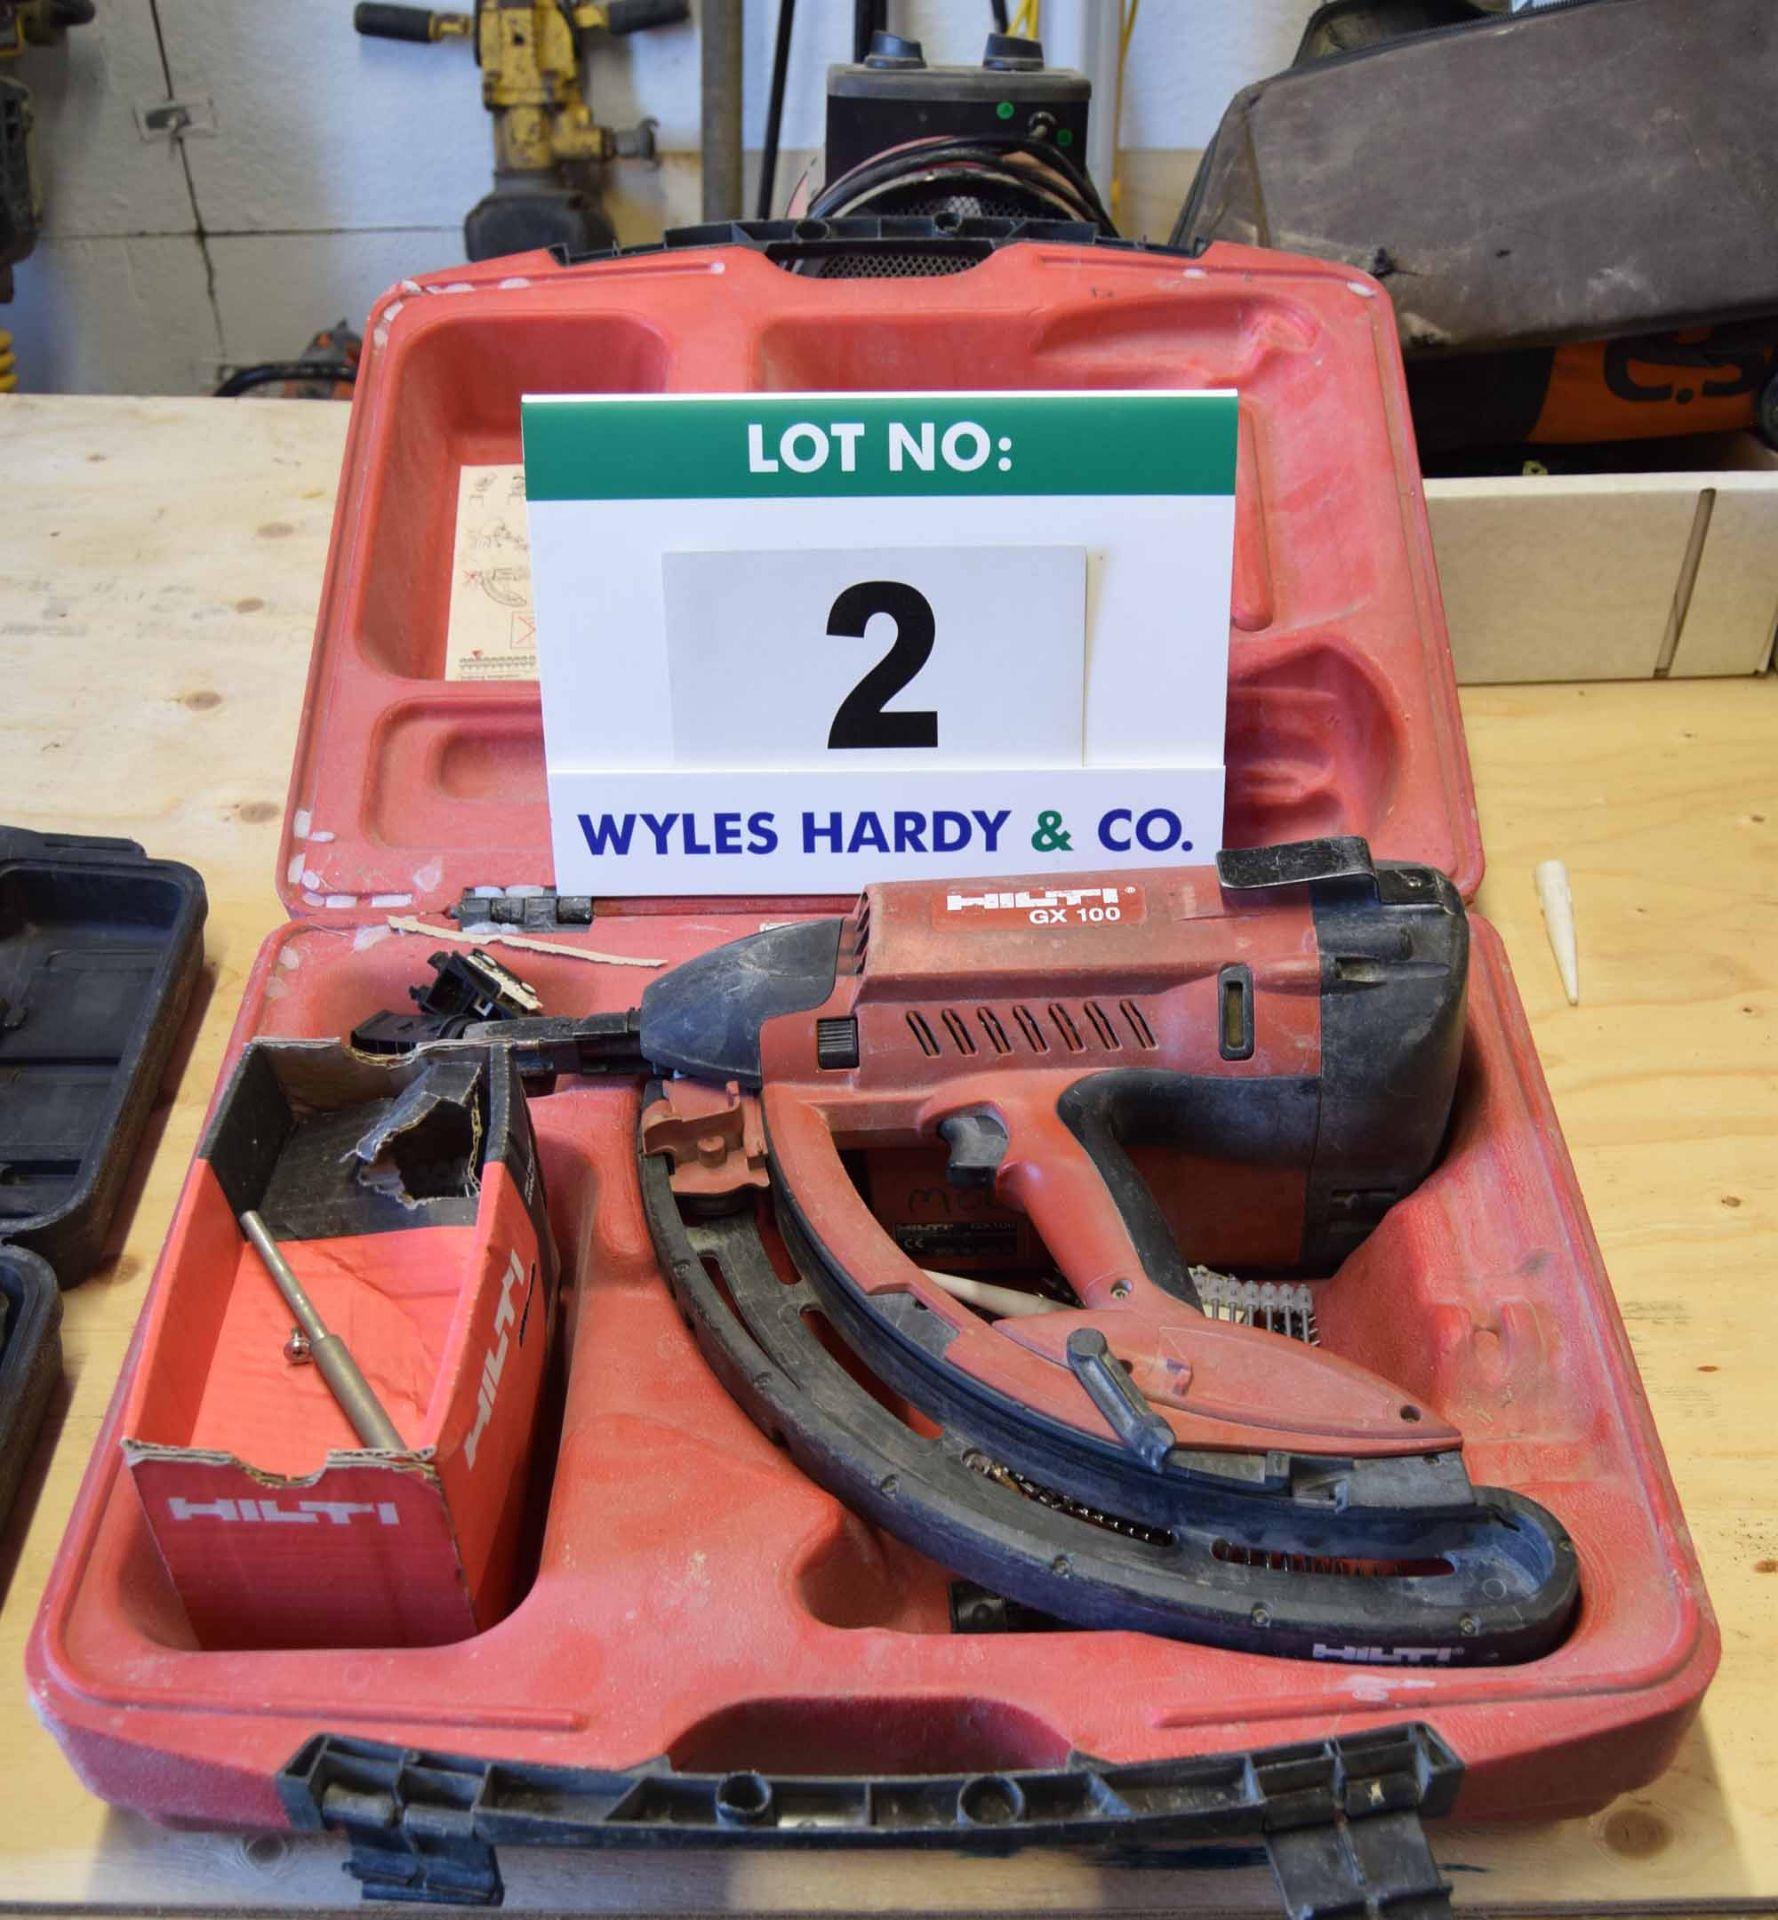 Lot 2 - A HILTI GX100 Gas Cartridge Powered Nail Gun in Rigid Plastic Carry/Storage Case